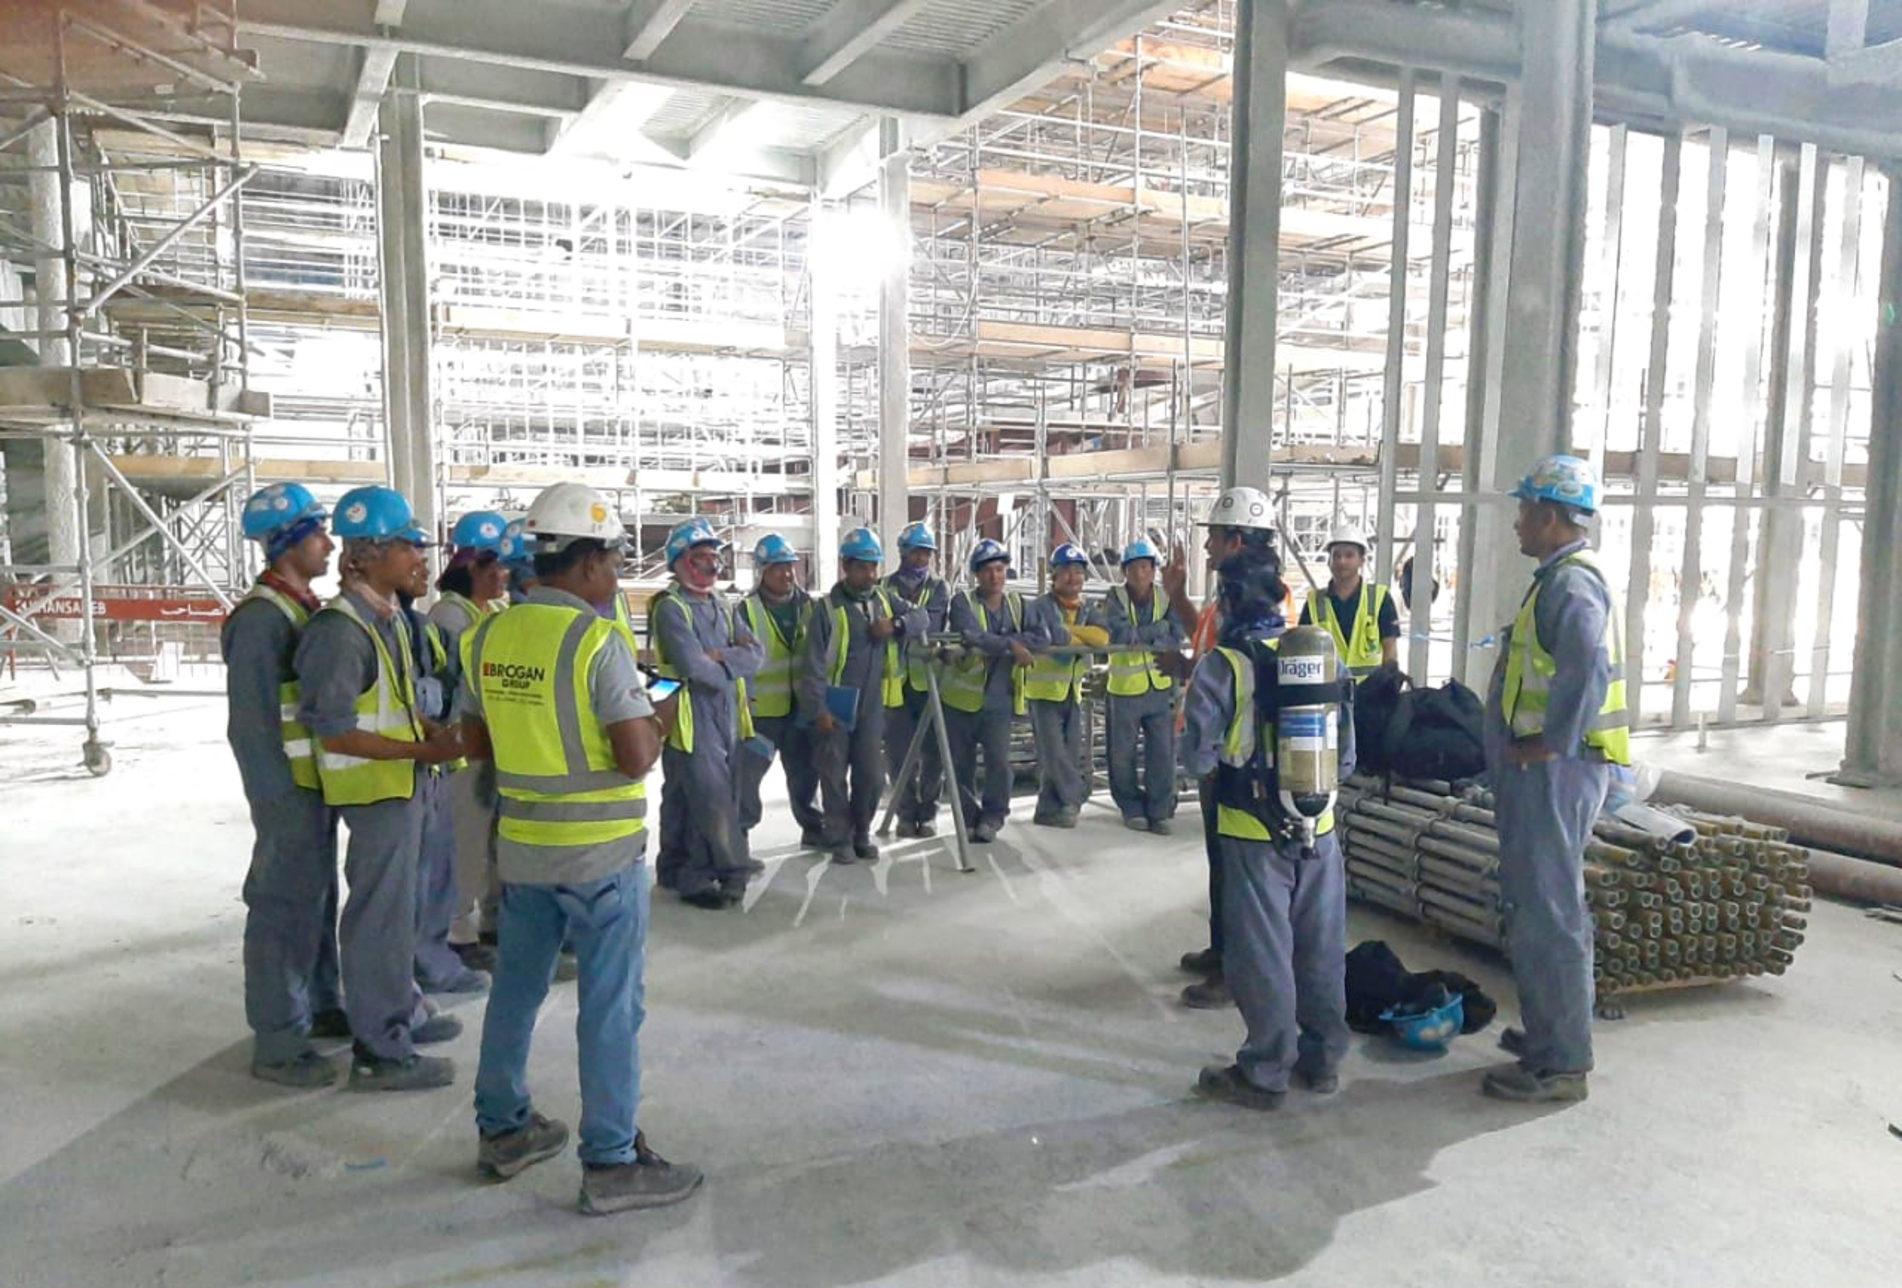 Further training for Brogan scaffolders in Dubai | 18th June